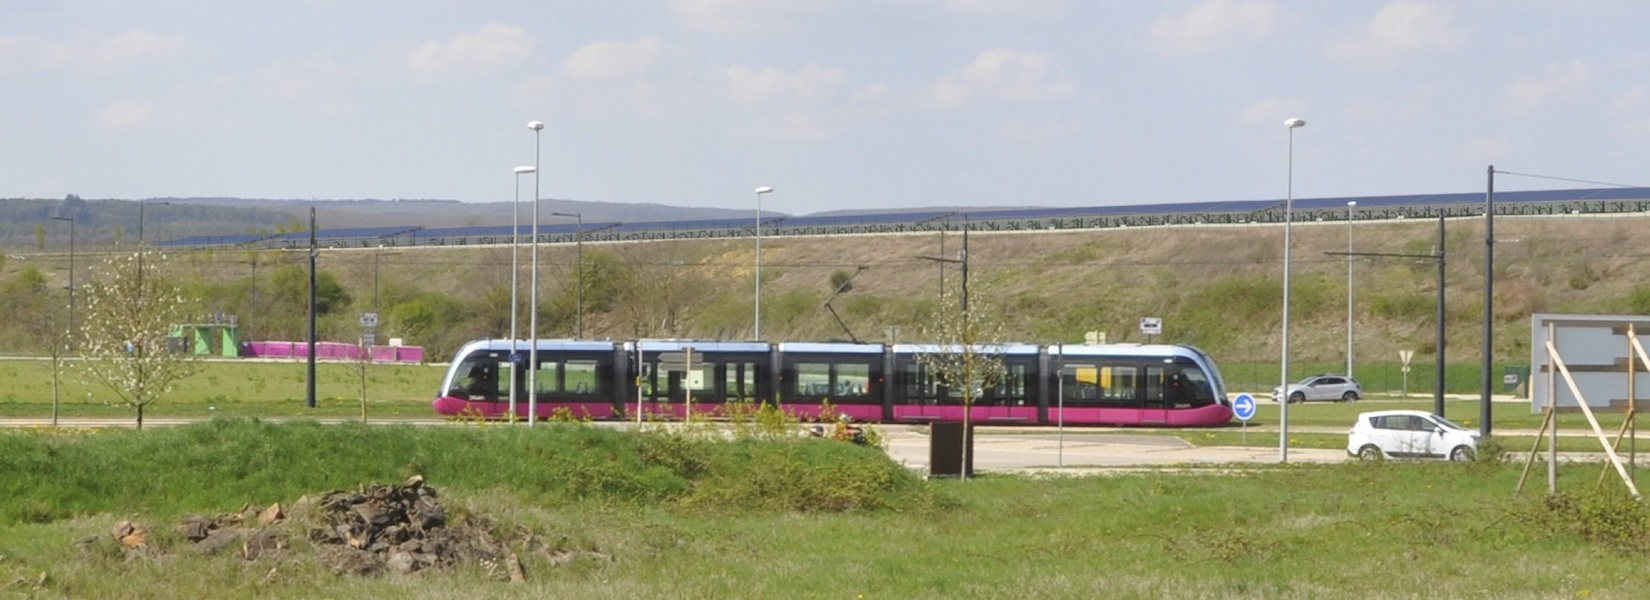 Page projet lendosphere tram 3